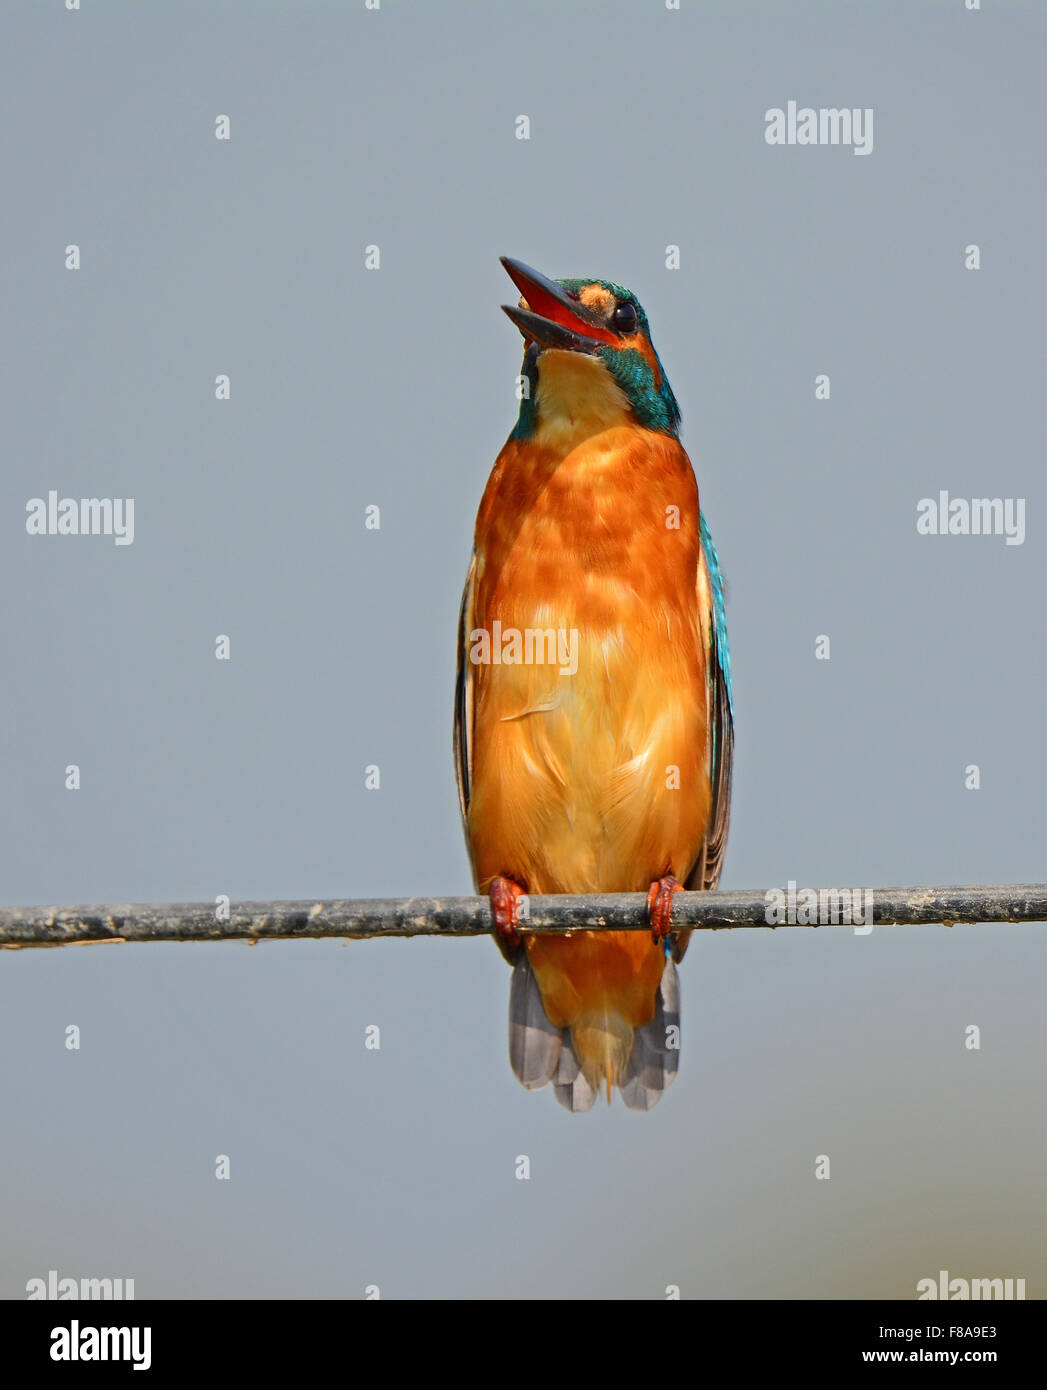 Kingfisher amenaza plantean Imagen De Stock